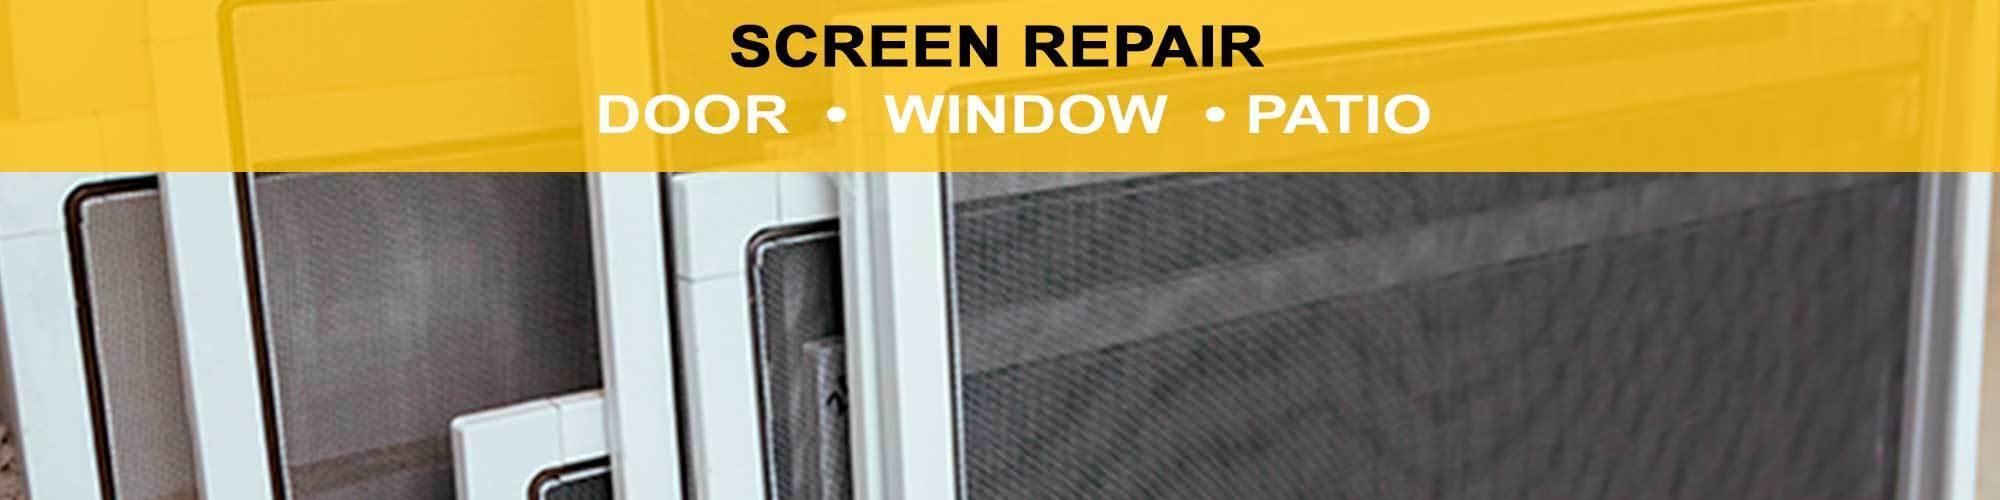 window screen repair kit ace